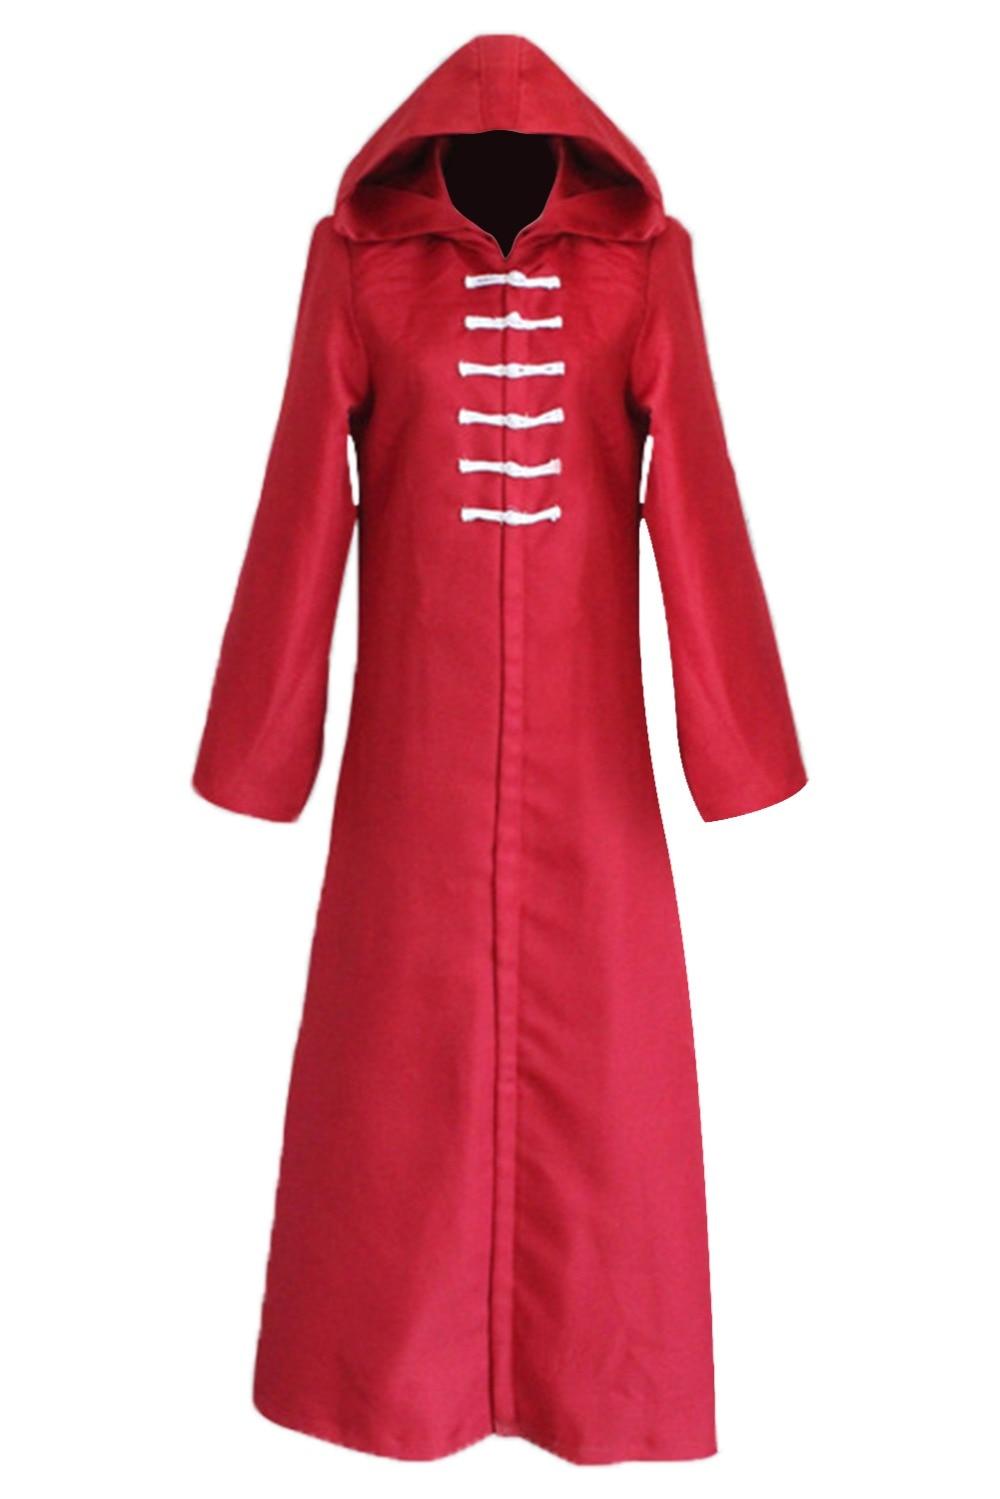 Anime Tokyo Ghoul Aogiri Tree Organization Eto Kirishima Touka Kirishima Ayato Cosplay Costumes Hooded Cloak Red Long Robe